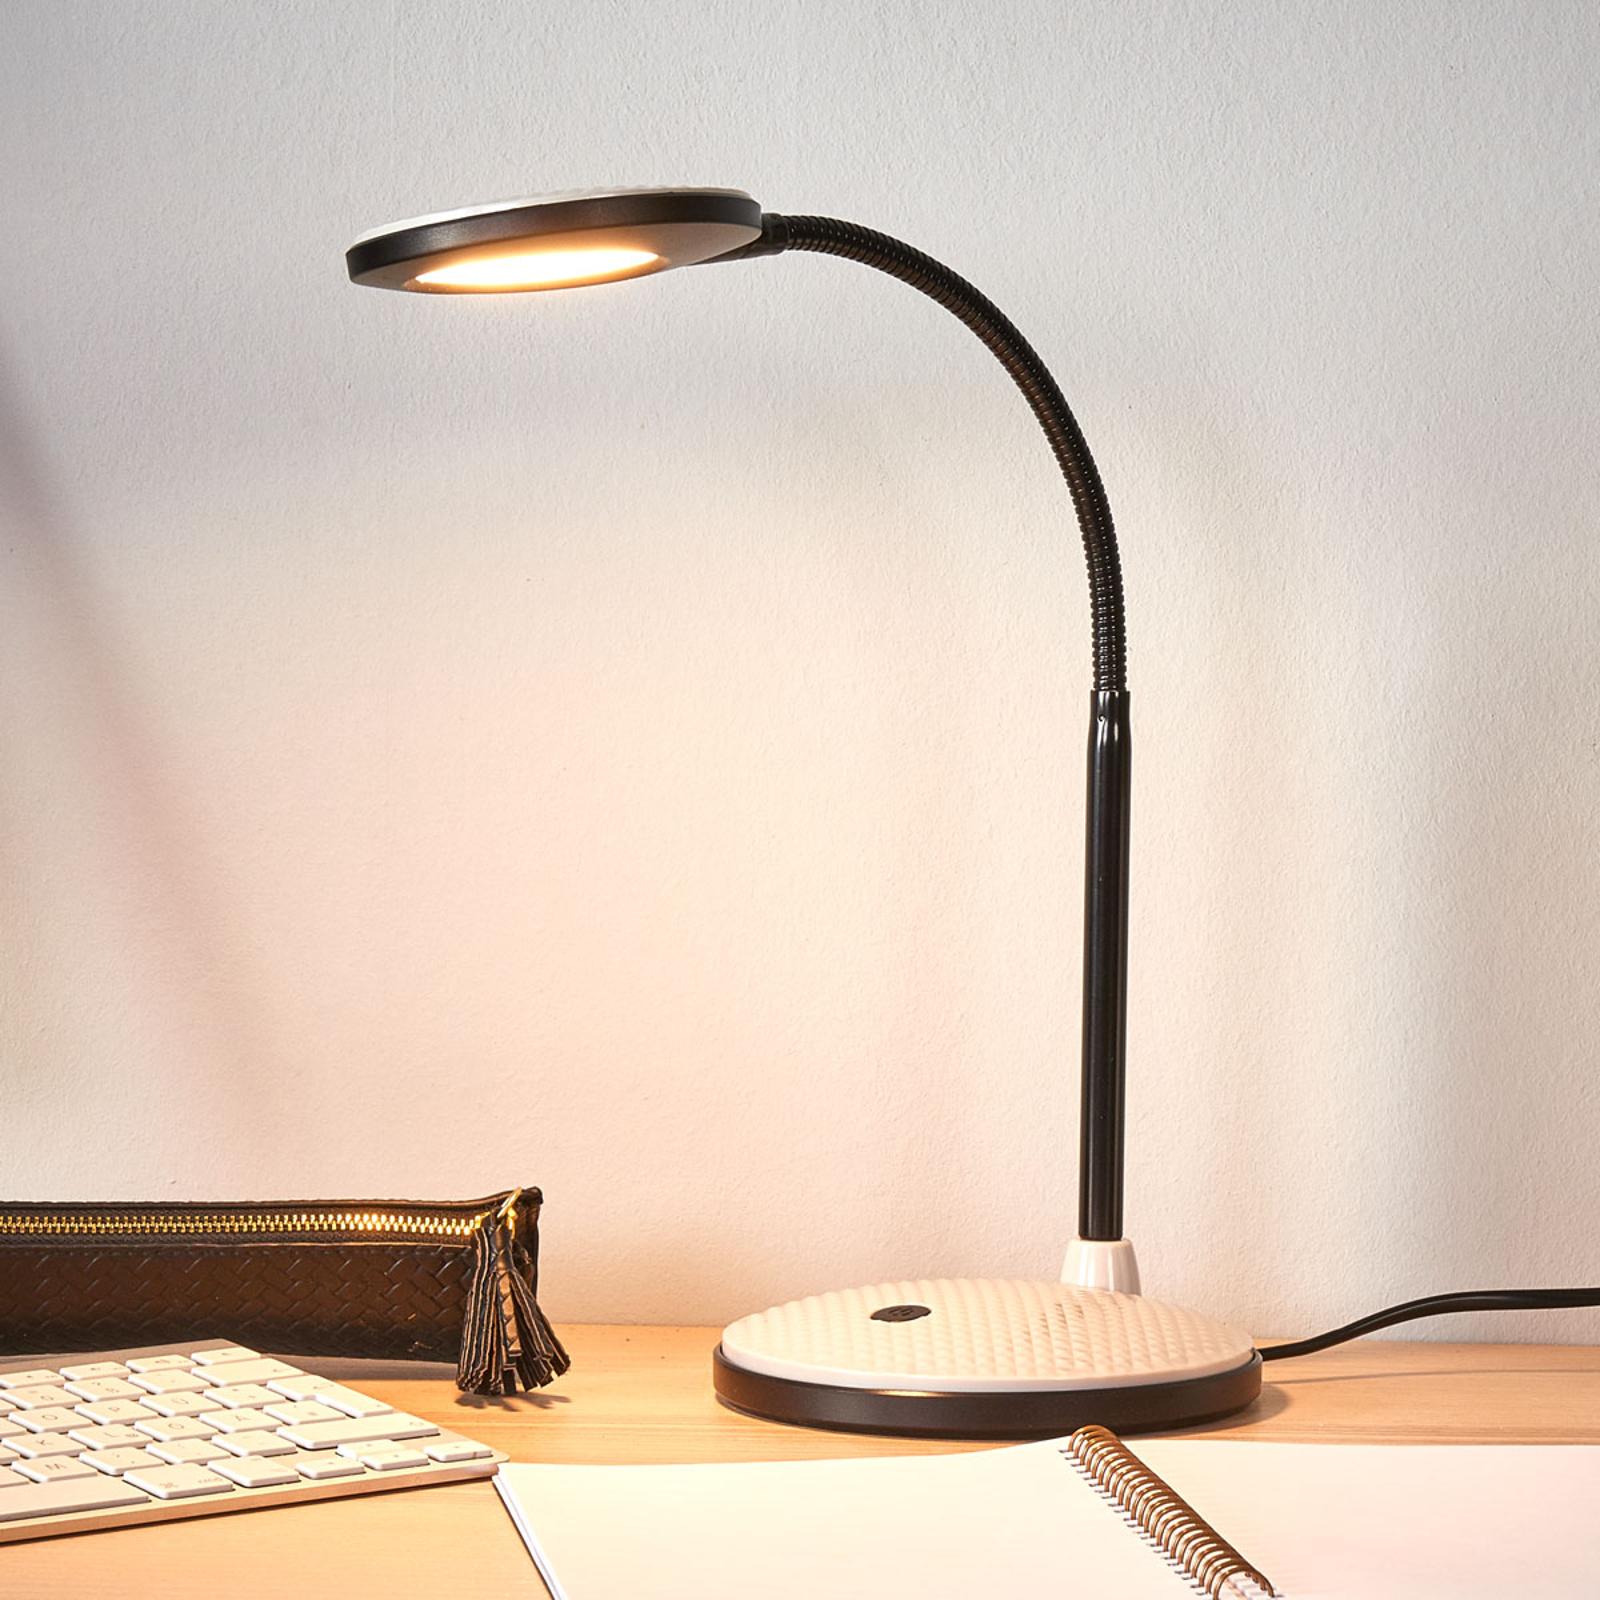 LED desk lamp Ivan in light grey and black_9643042_1